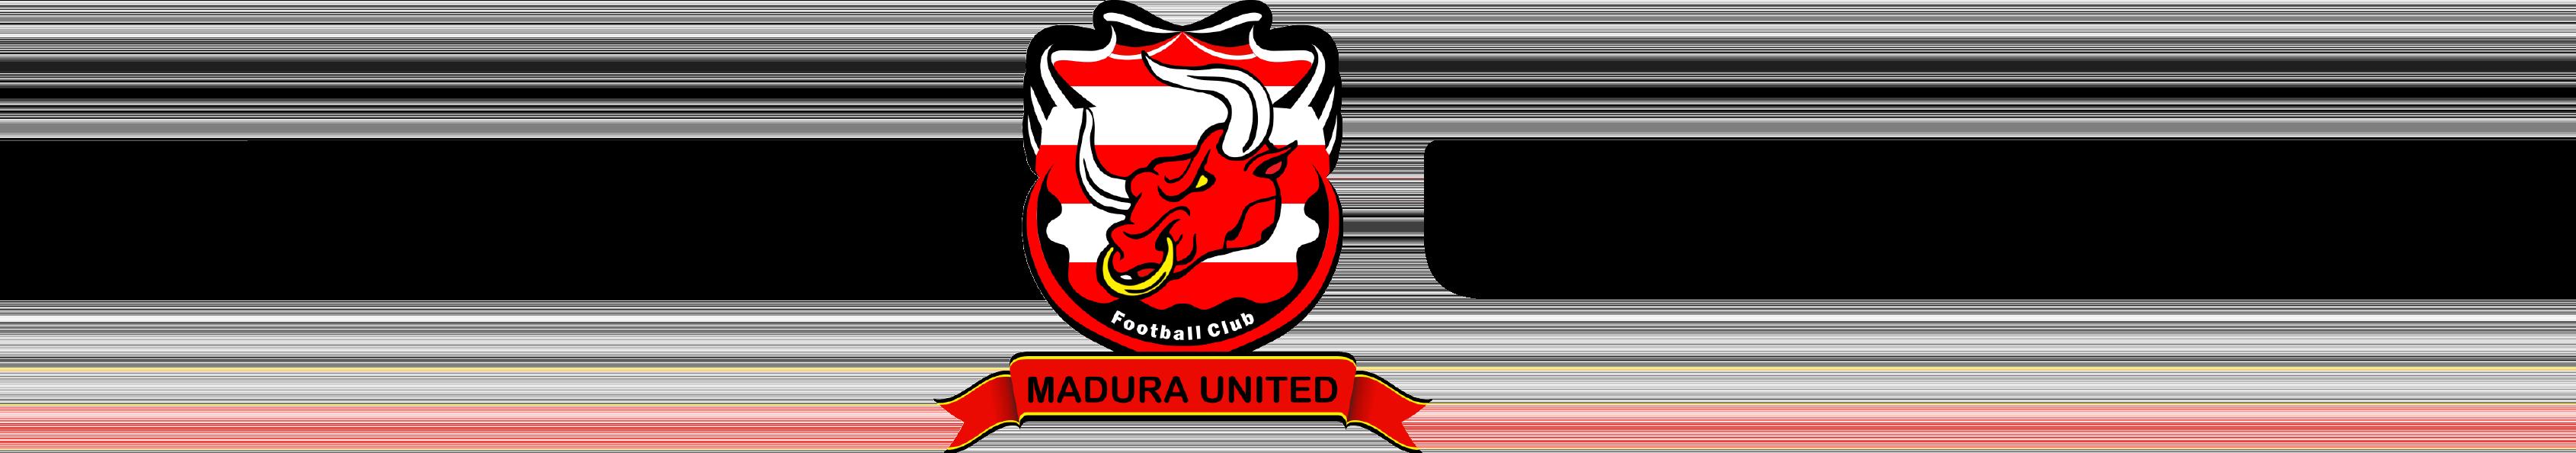 Alfath Fathier Pemain Terbaik Shopee Liga 1 2019 1 - marketpialadunia.com